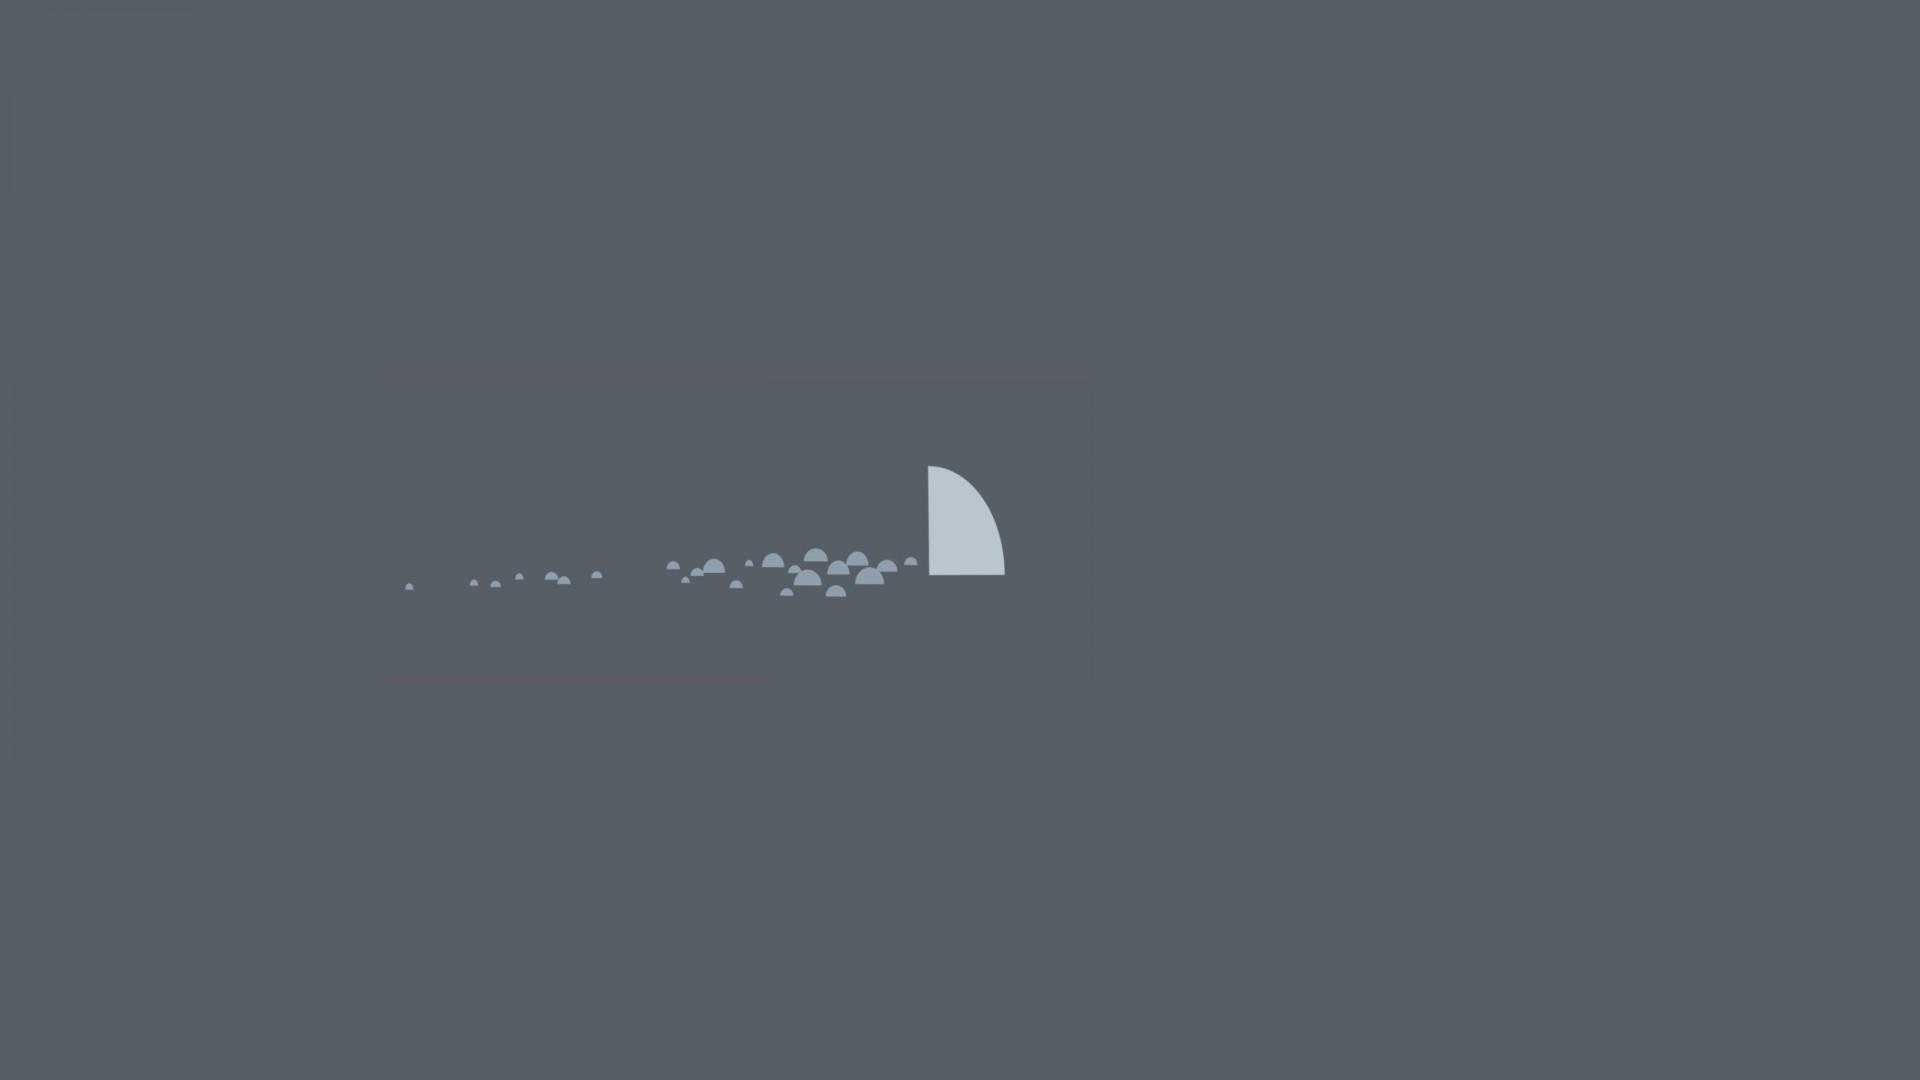 Shark week wallpaper shark wave voltagebd Images